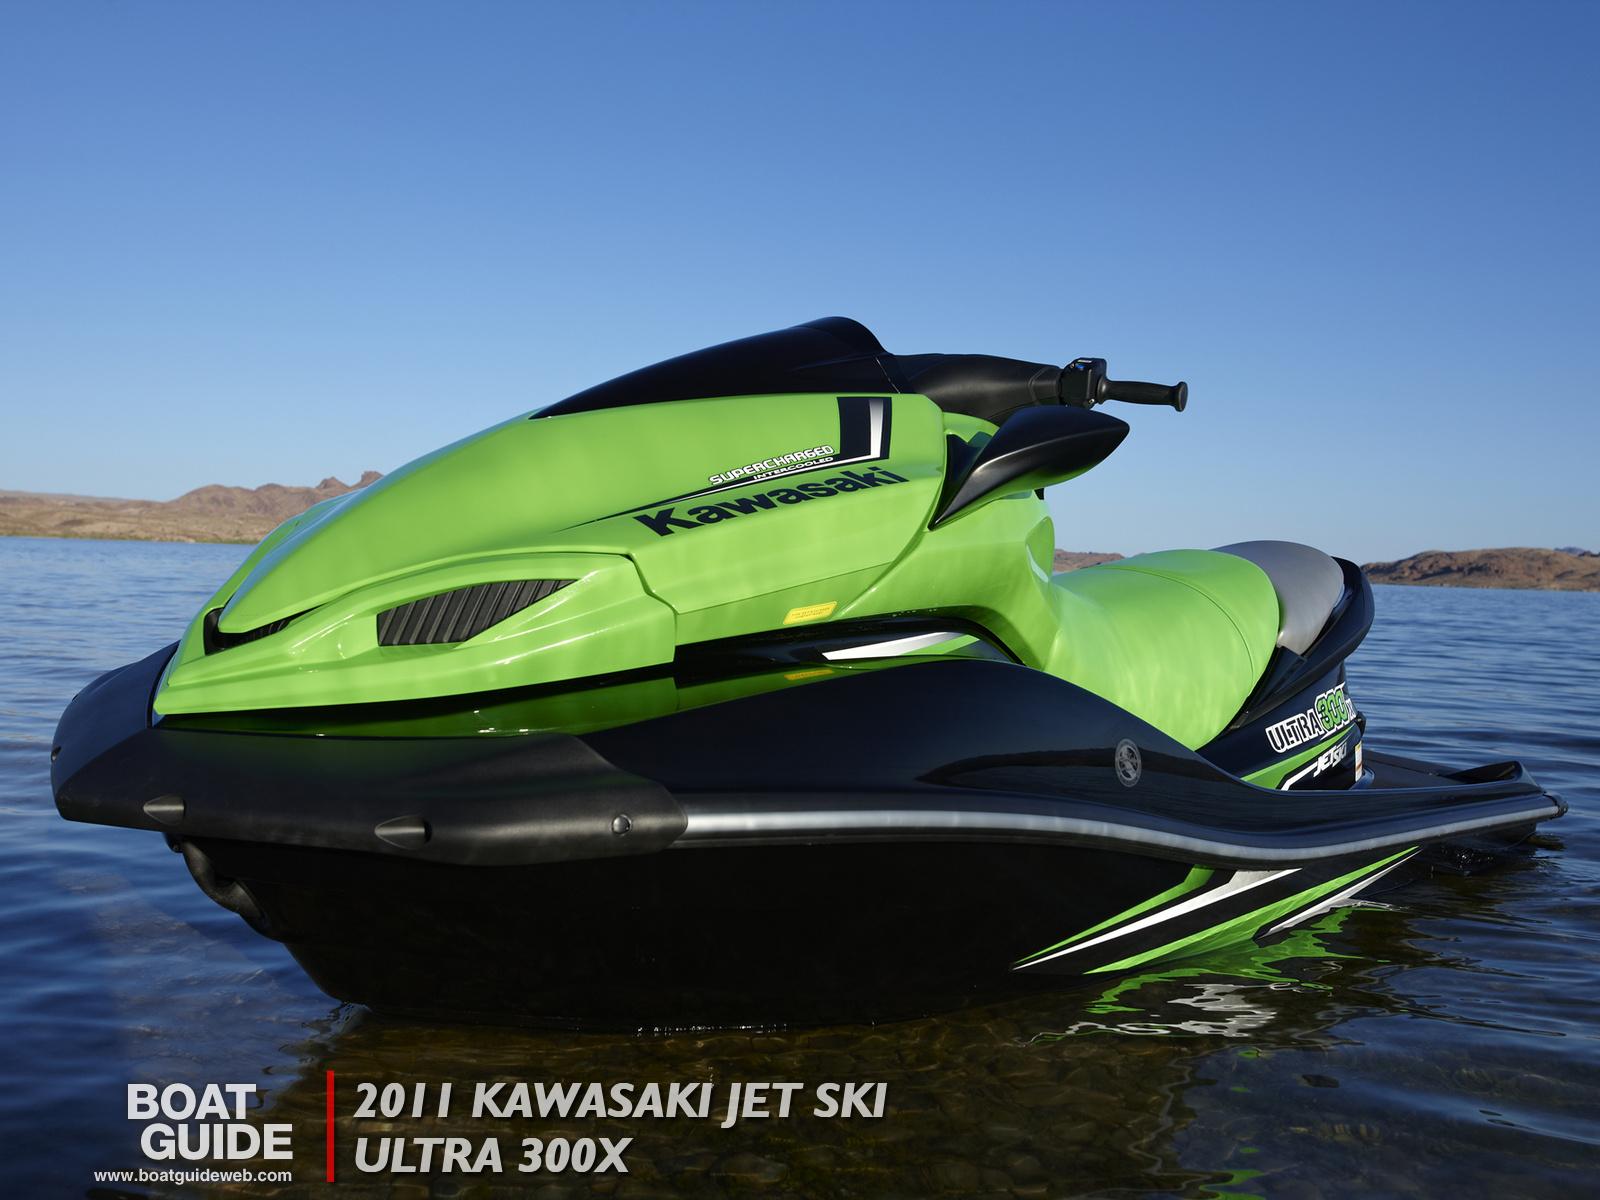 Boat Kawasaki Jet Ski The Guide 492539 Wallpaper wallpaper